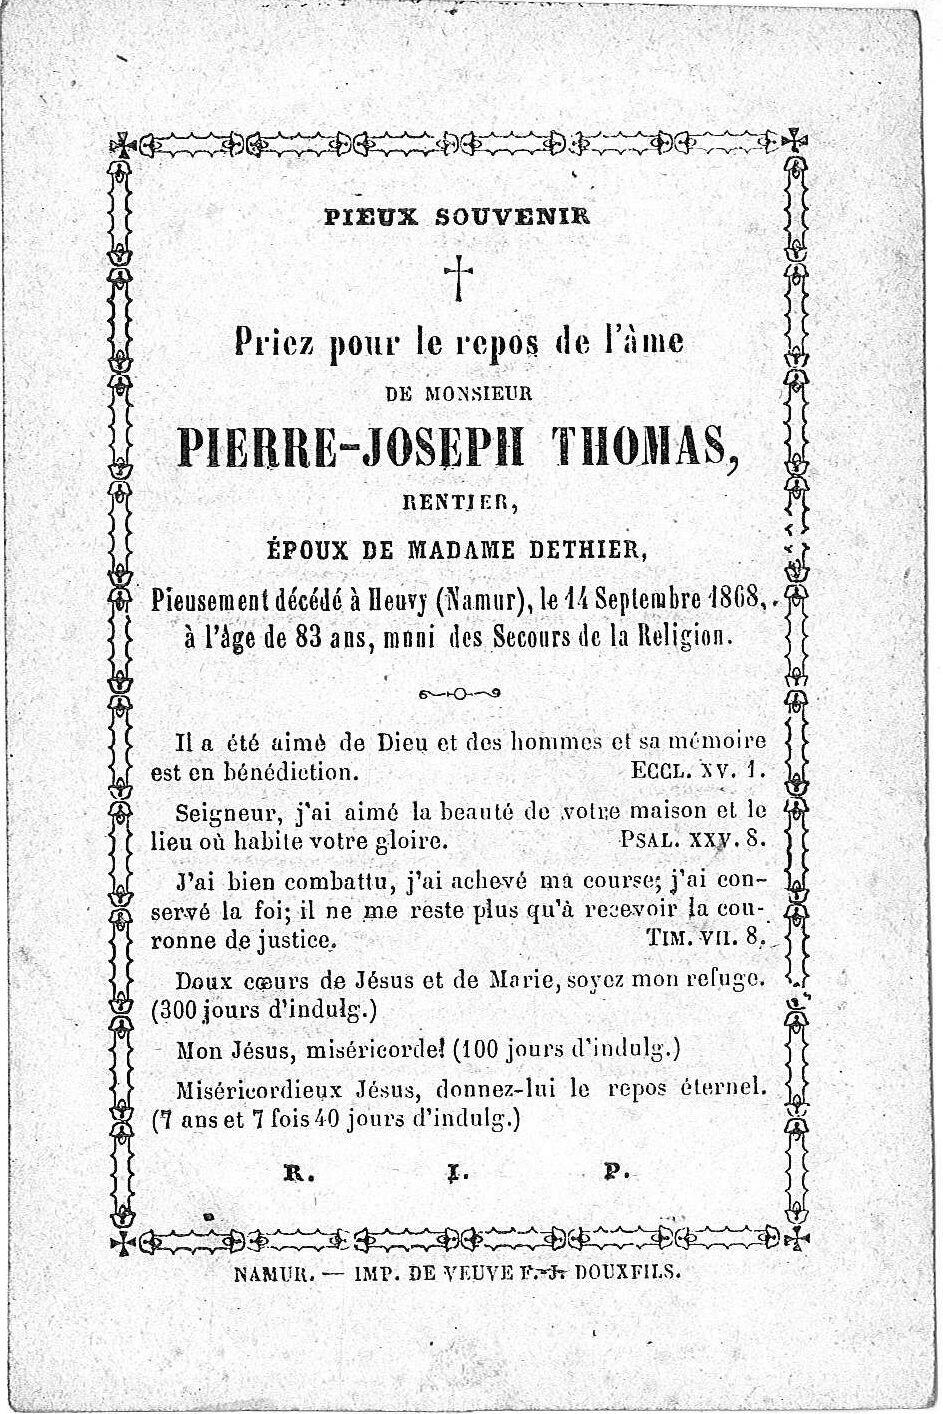 Pierre-Joseph(1868)20120621134457_00047.jpg